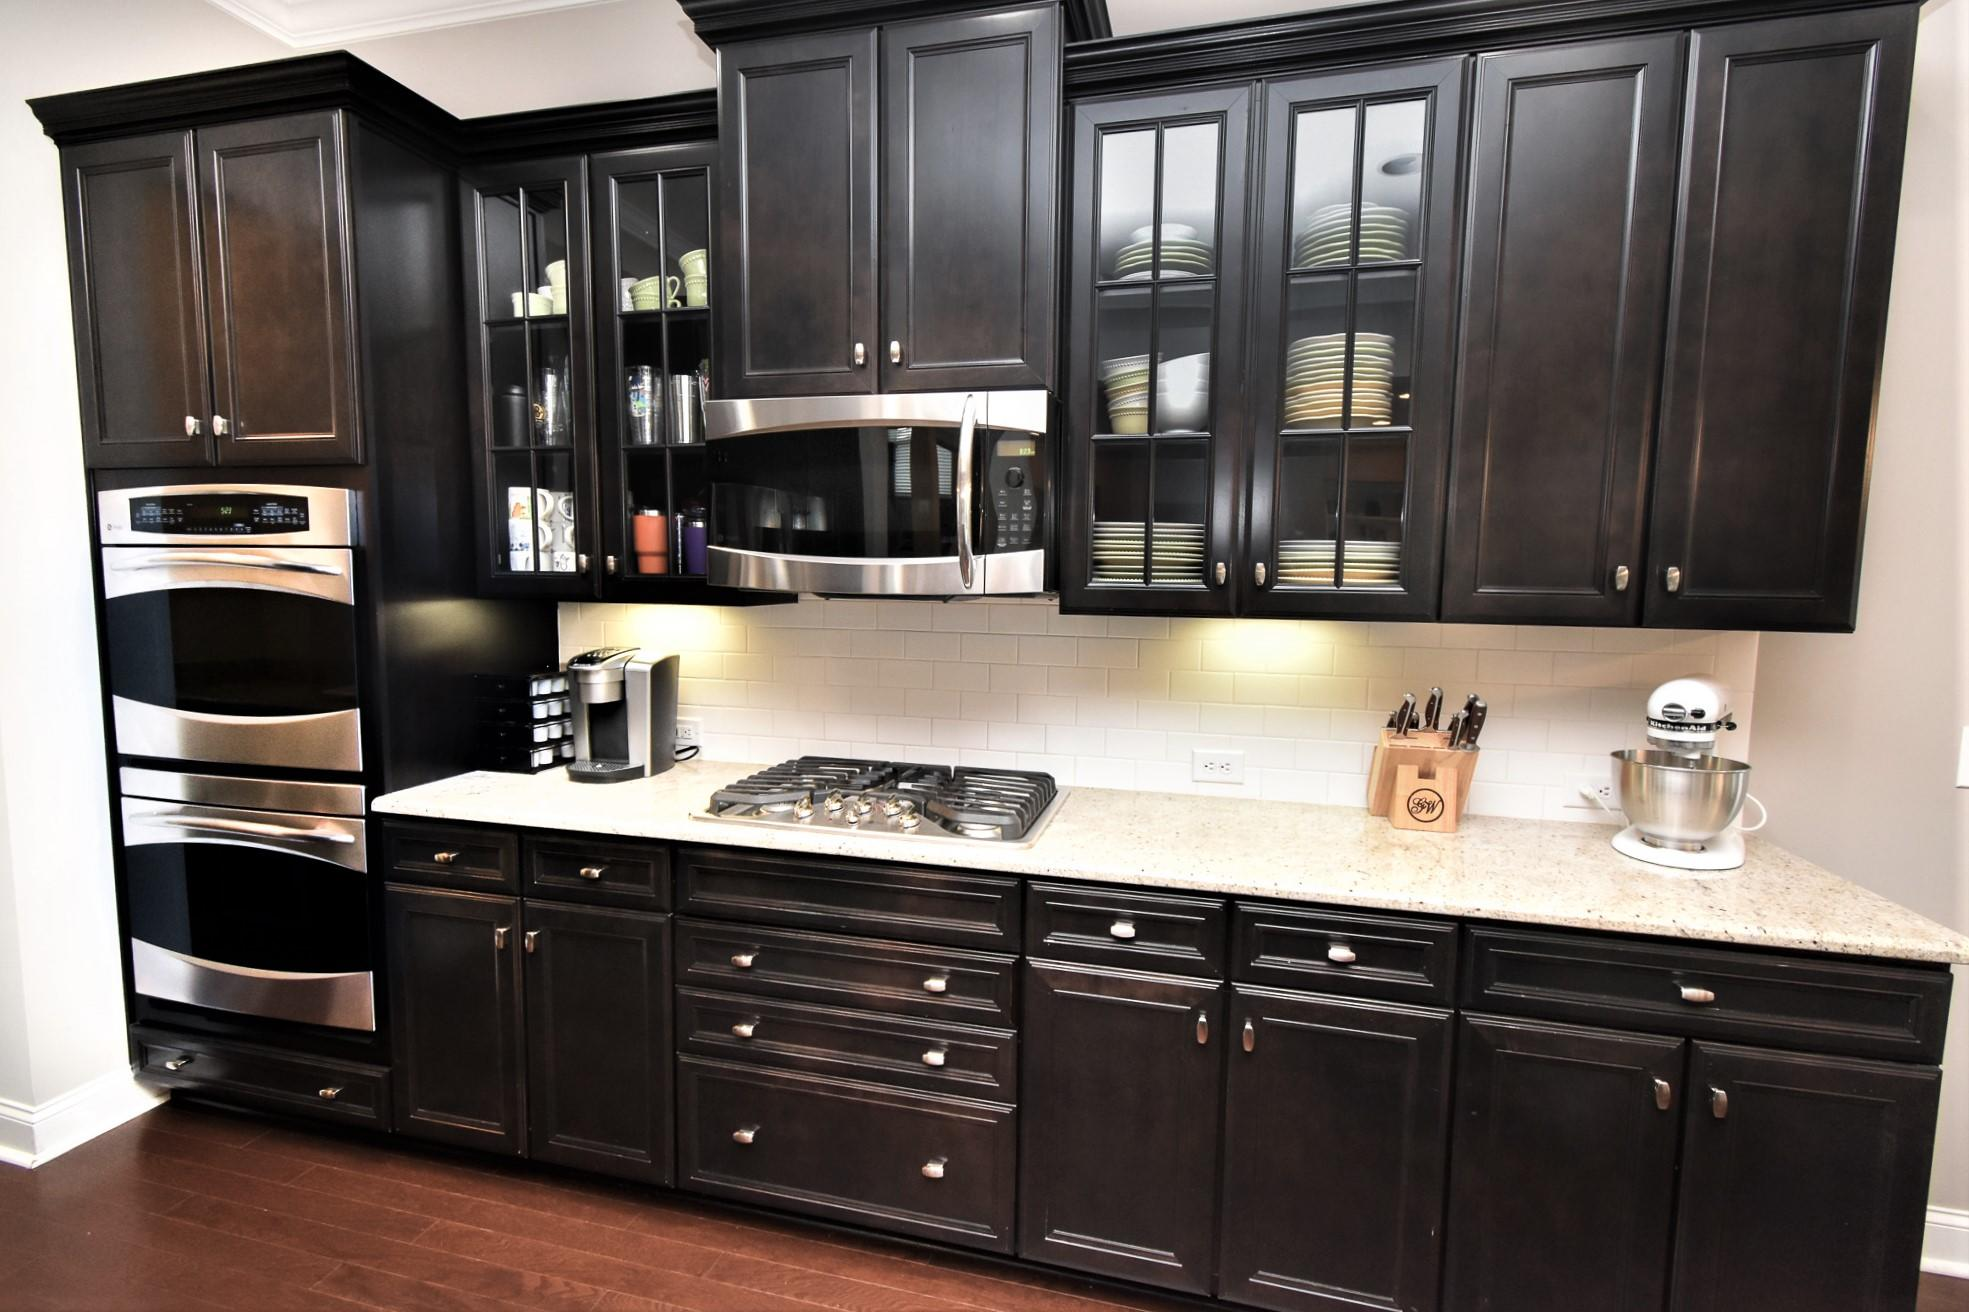 Carolina Park Homes For Sale - 1480 Croaton, Mount Pleasant, SC - 21